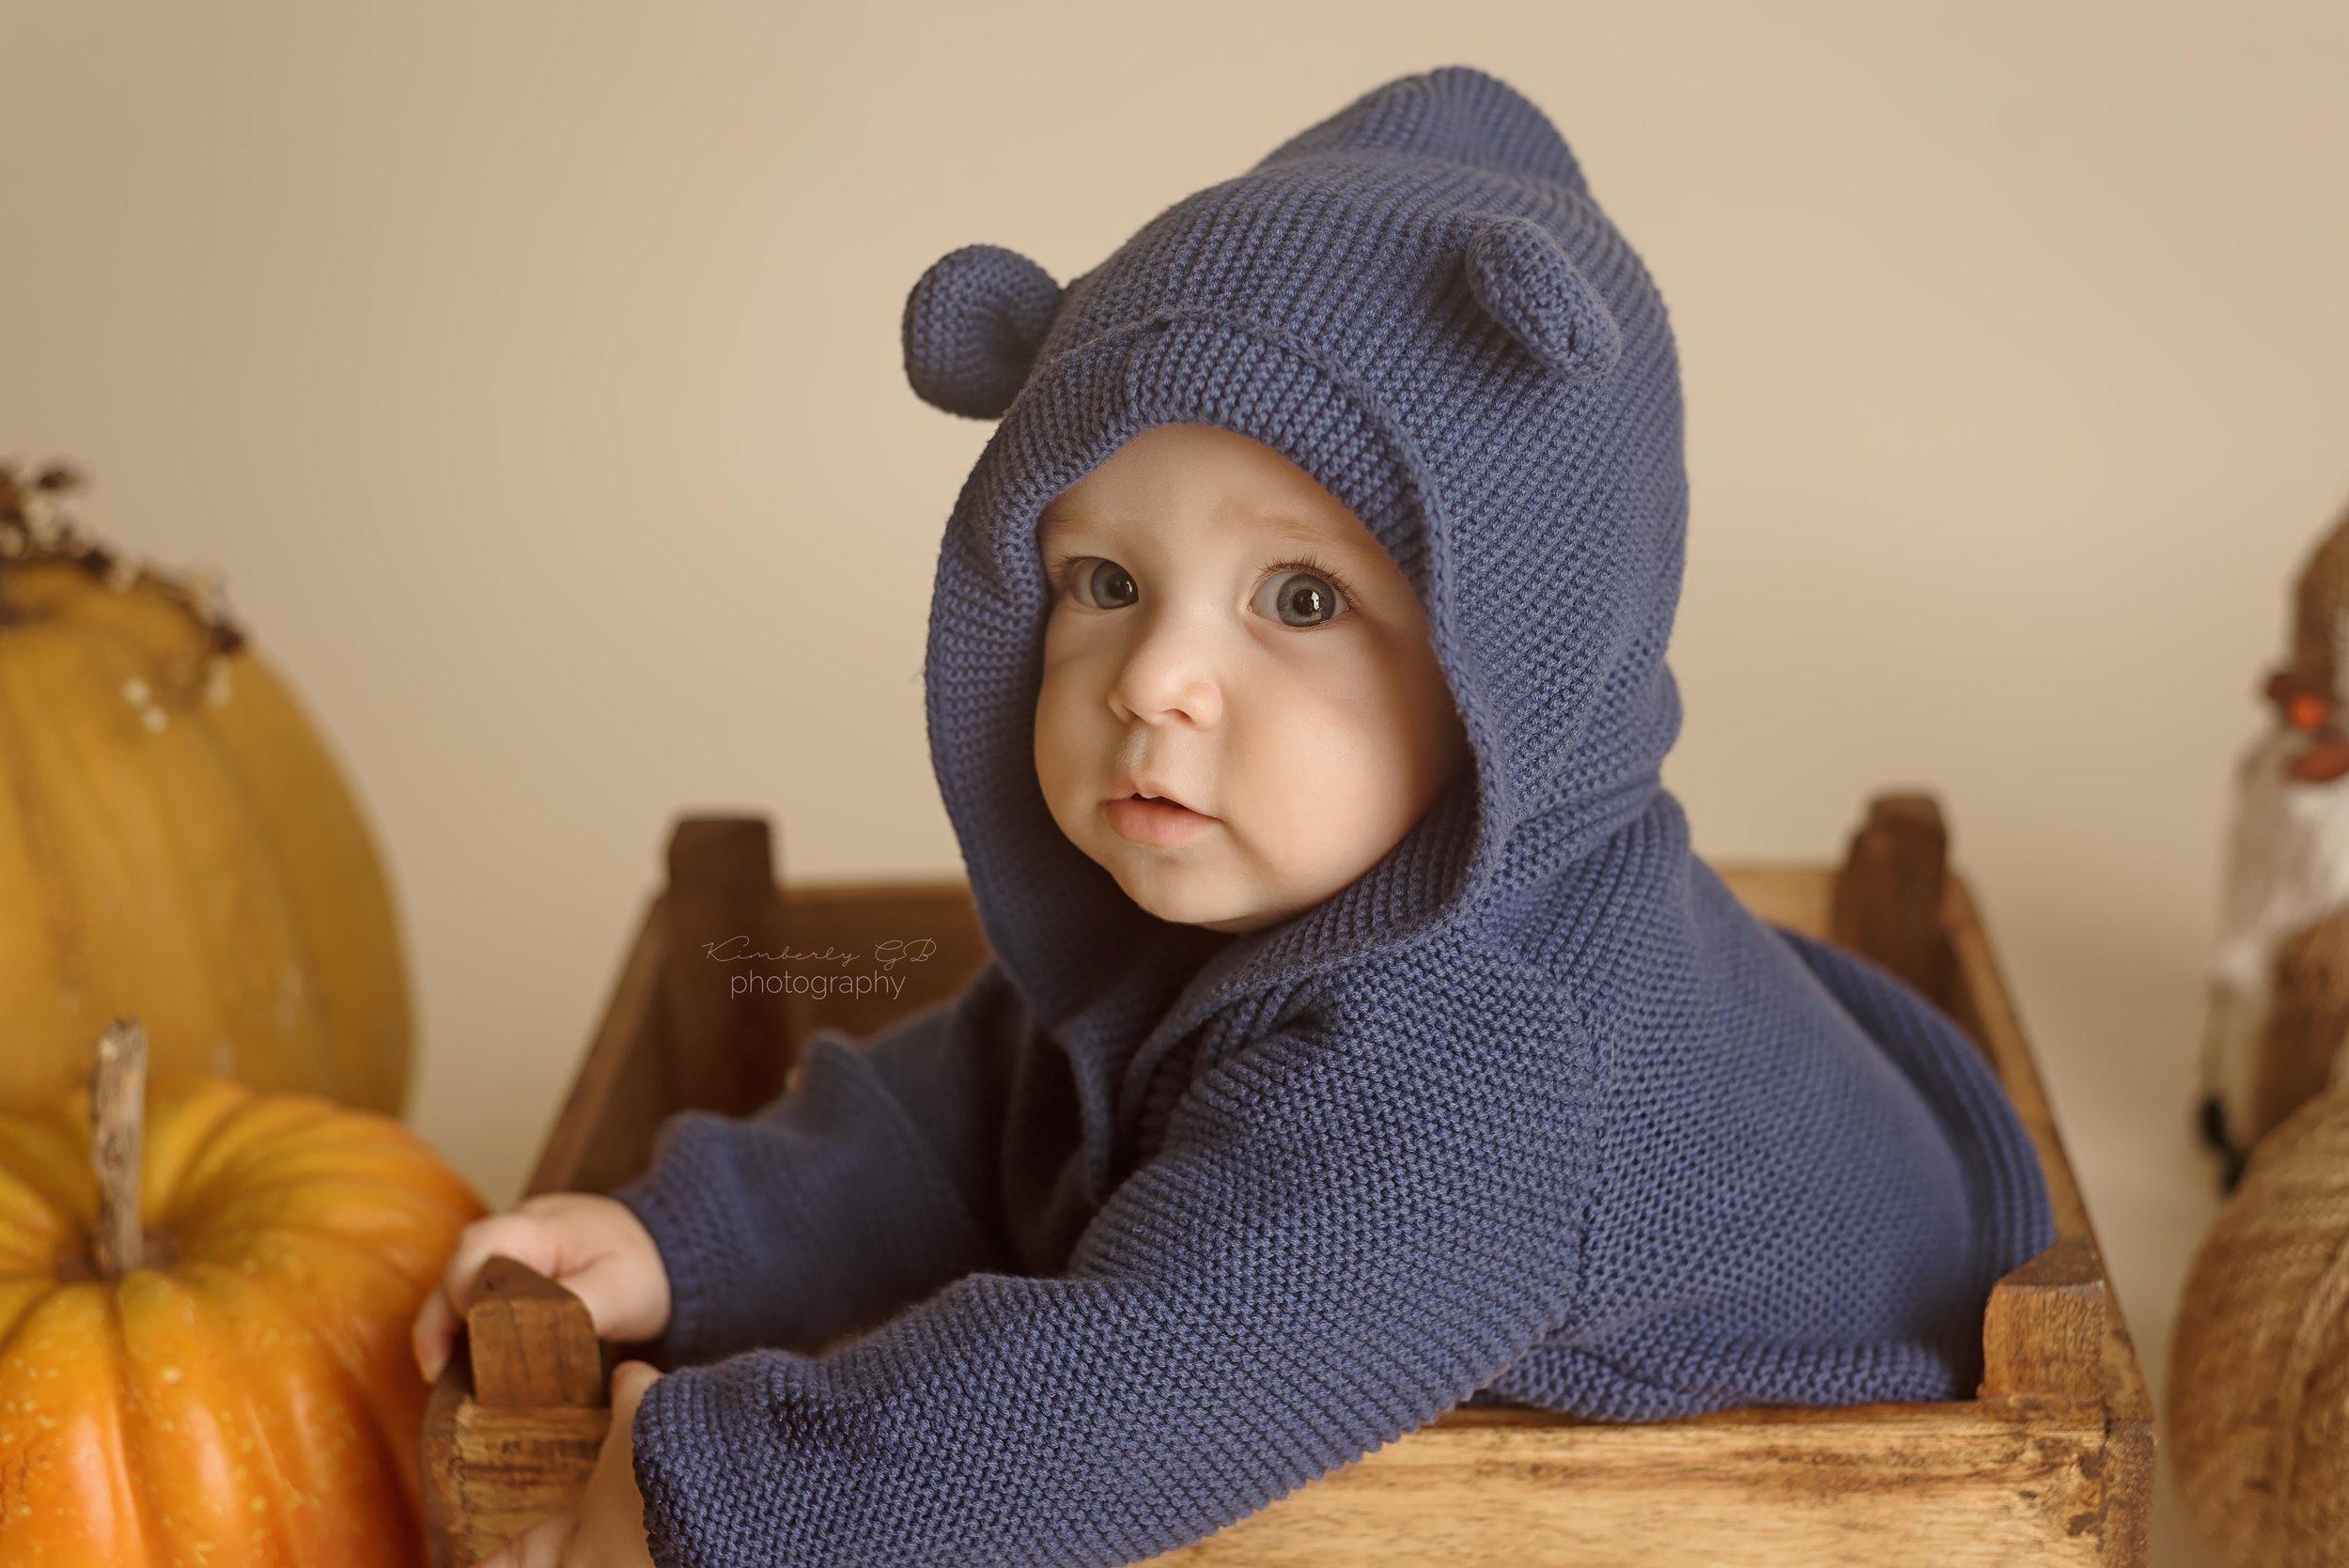 fotografia-de-ninos-bebes-kids-children-en-puerto-rico-kimberly-gb-photography-fotografa-45.jpg